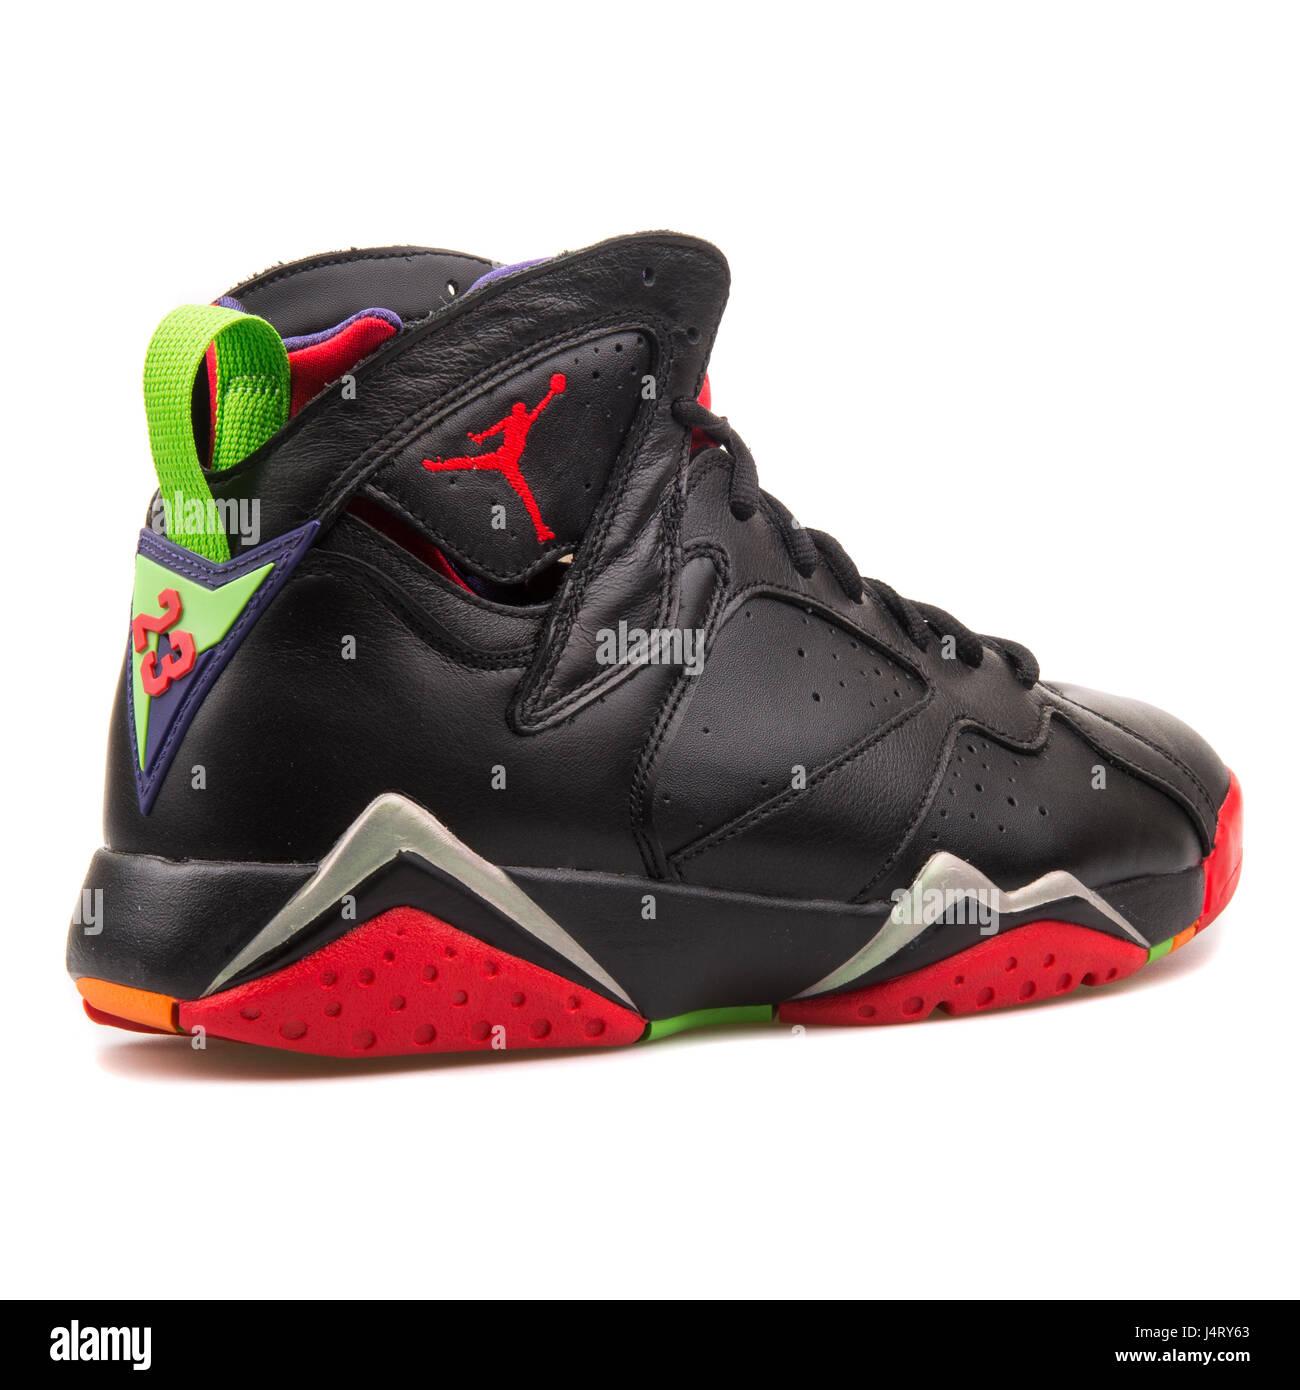 new arrivals 09df5 58e5e Nike Air Jordan 7 Retro - 304775-029 Stock Photo: 140667803 ...